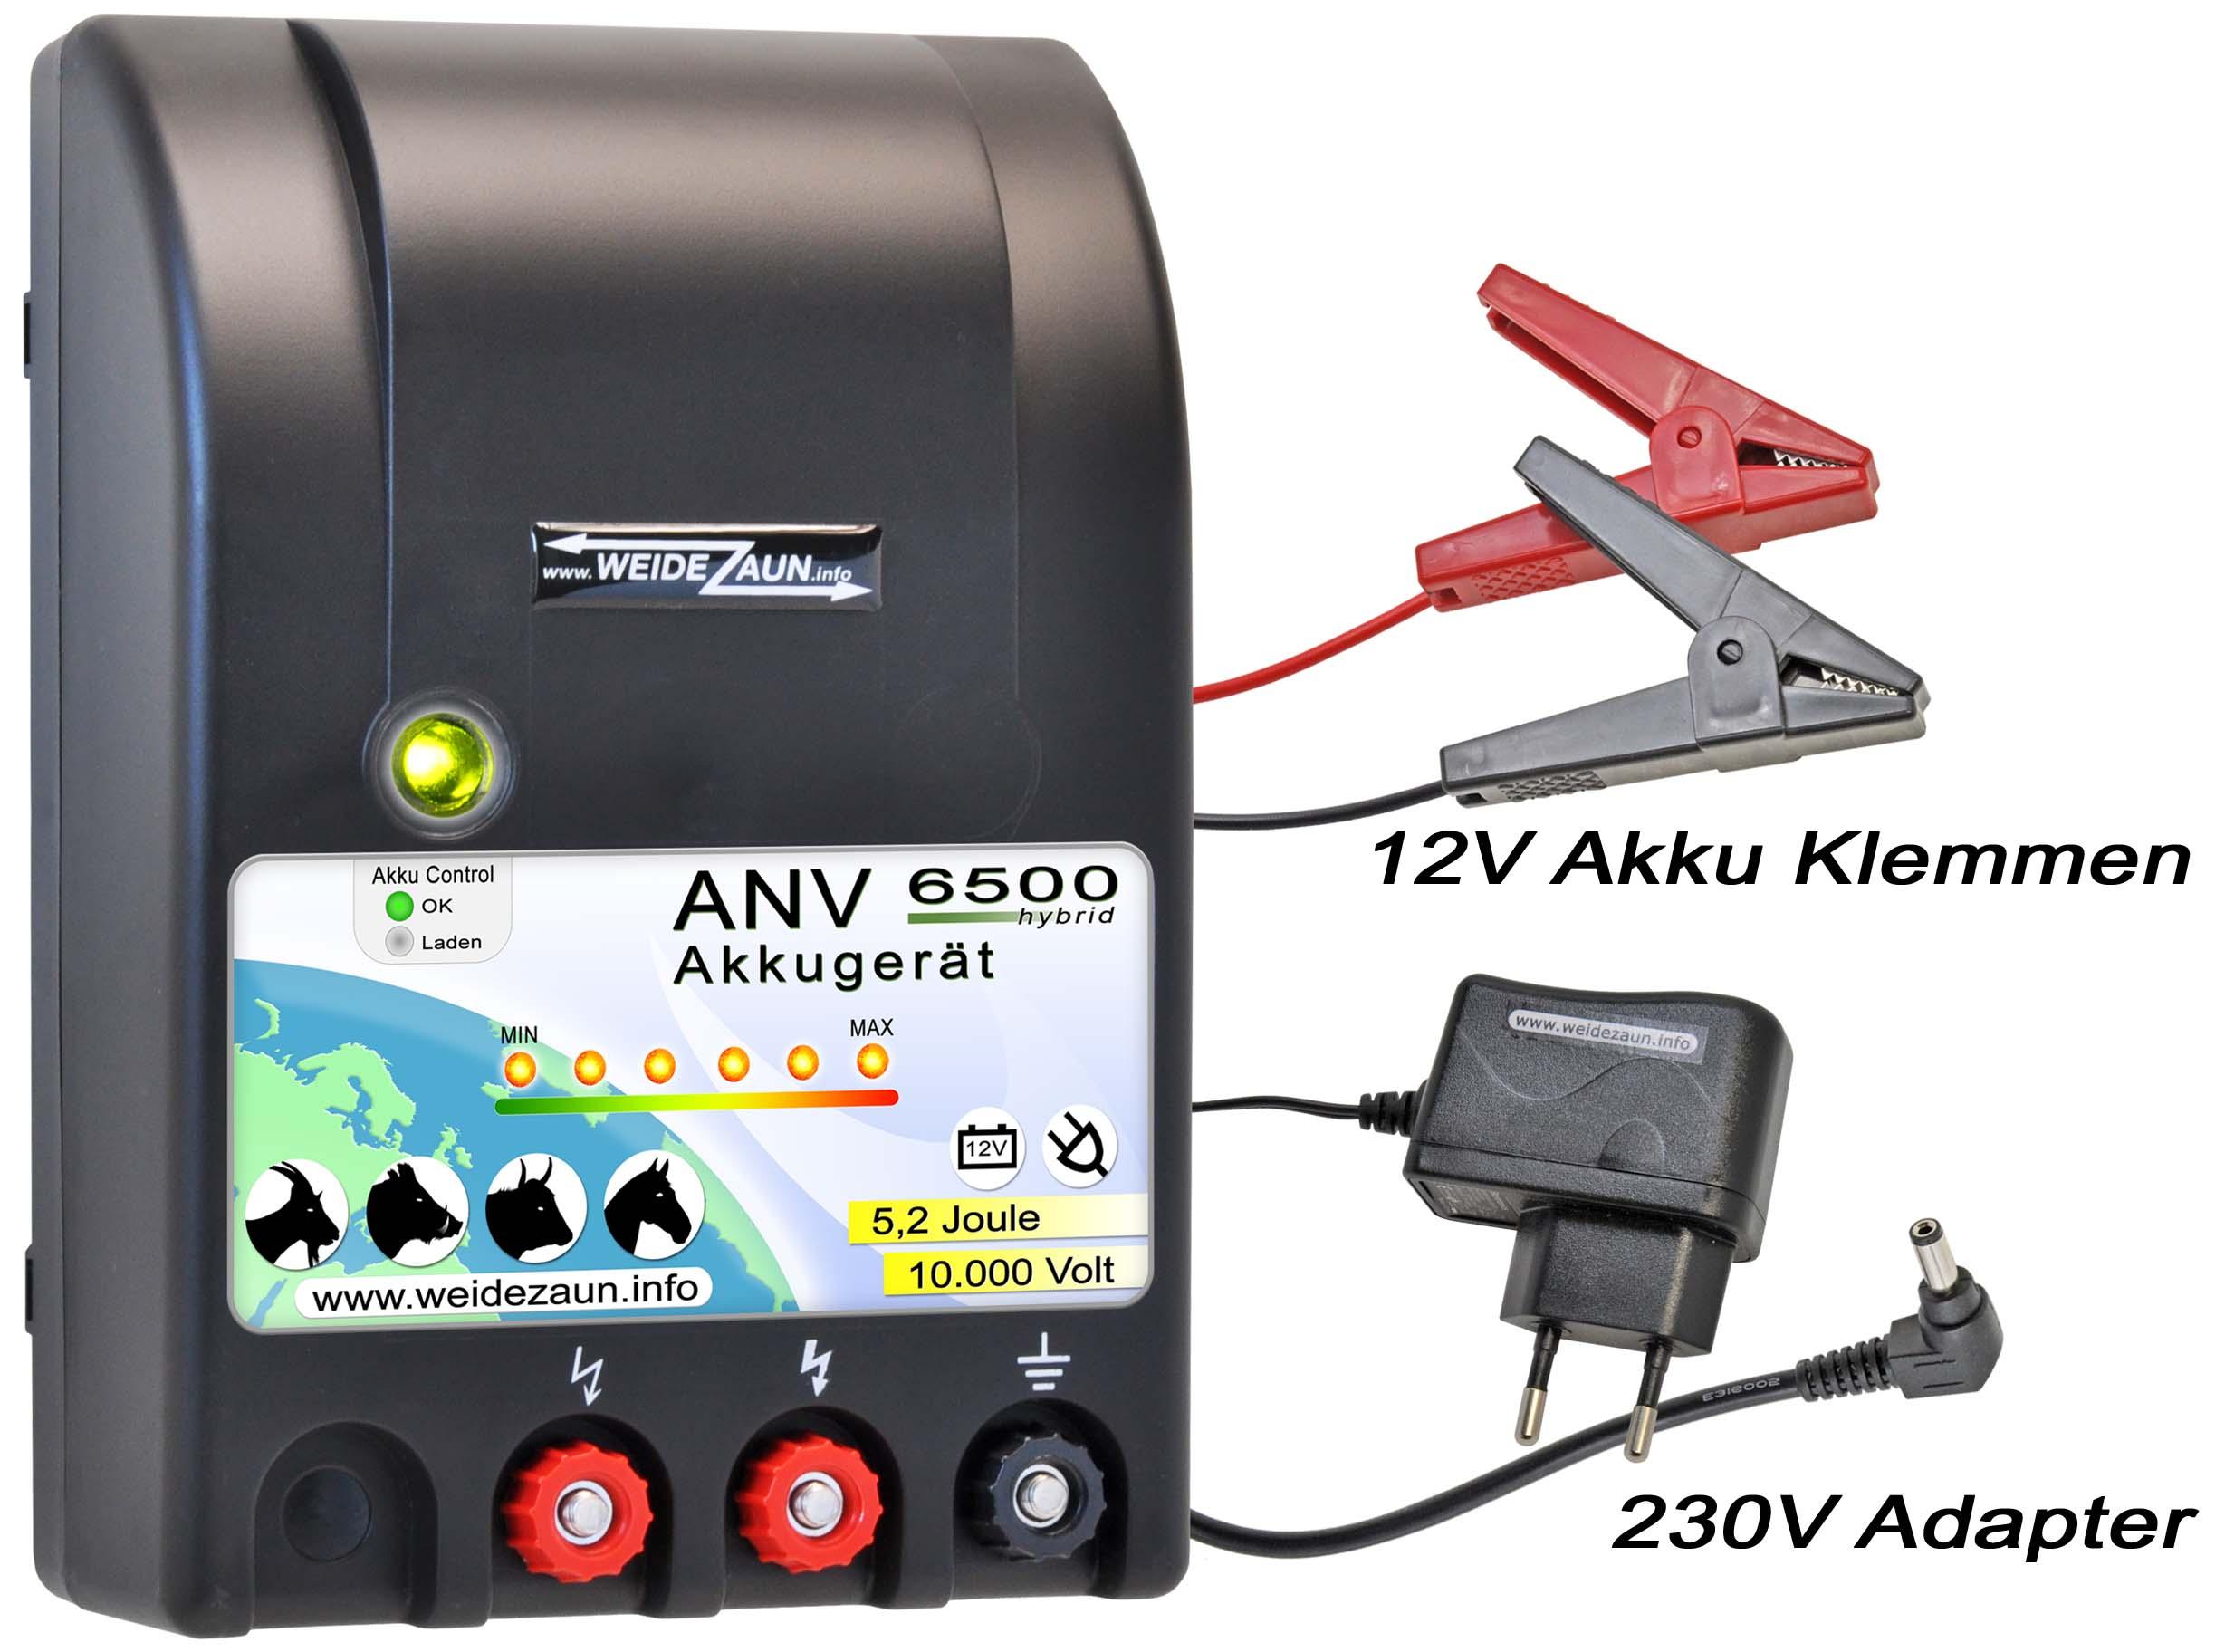 12v 230v batterieger t netzger t weidezaunger t weidezaun schlagger t akku ebay. Black Bedroom Furniture Sets. Home Design Ideas